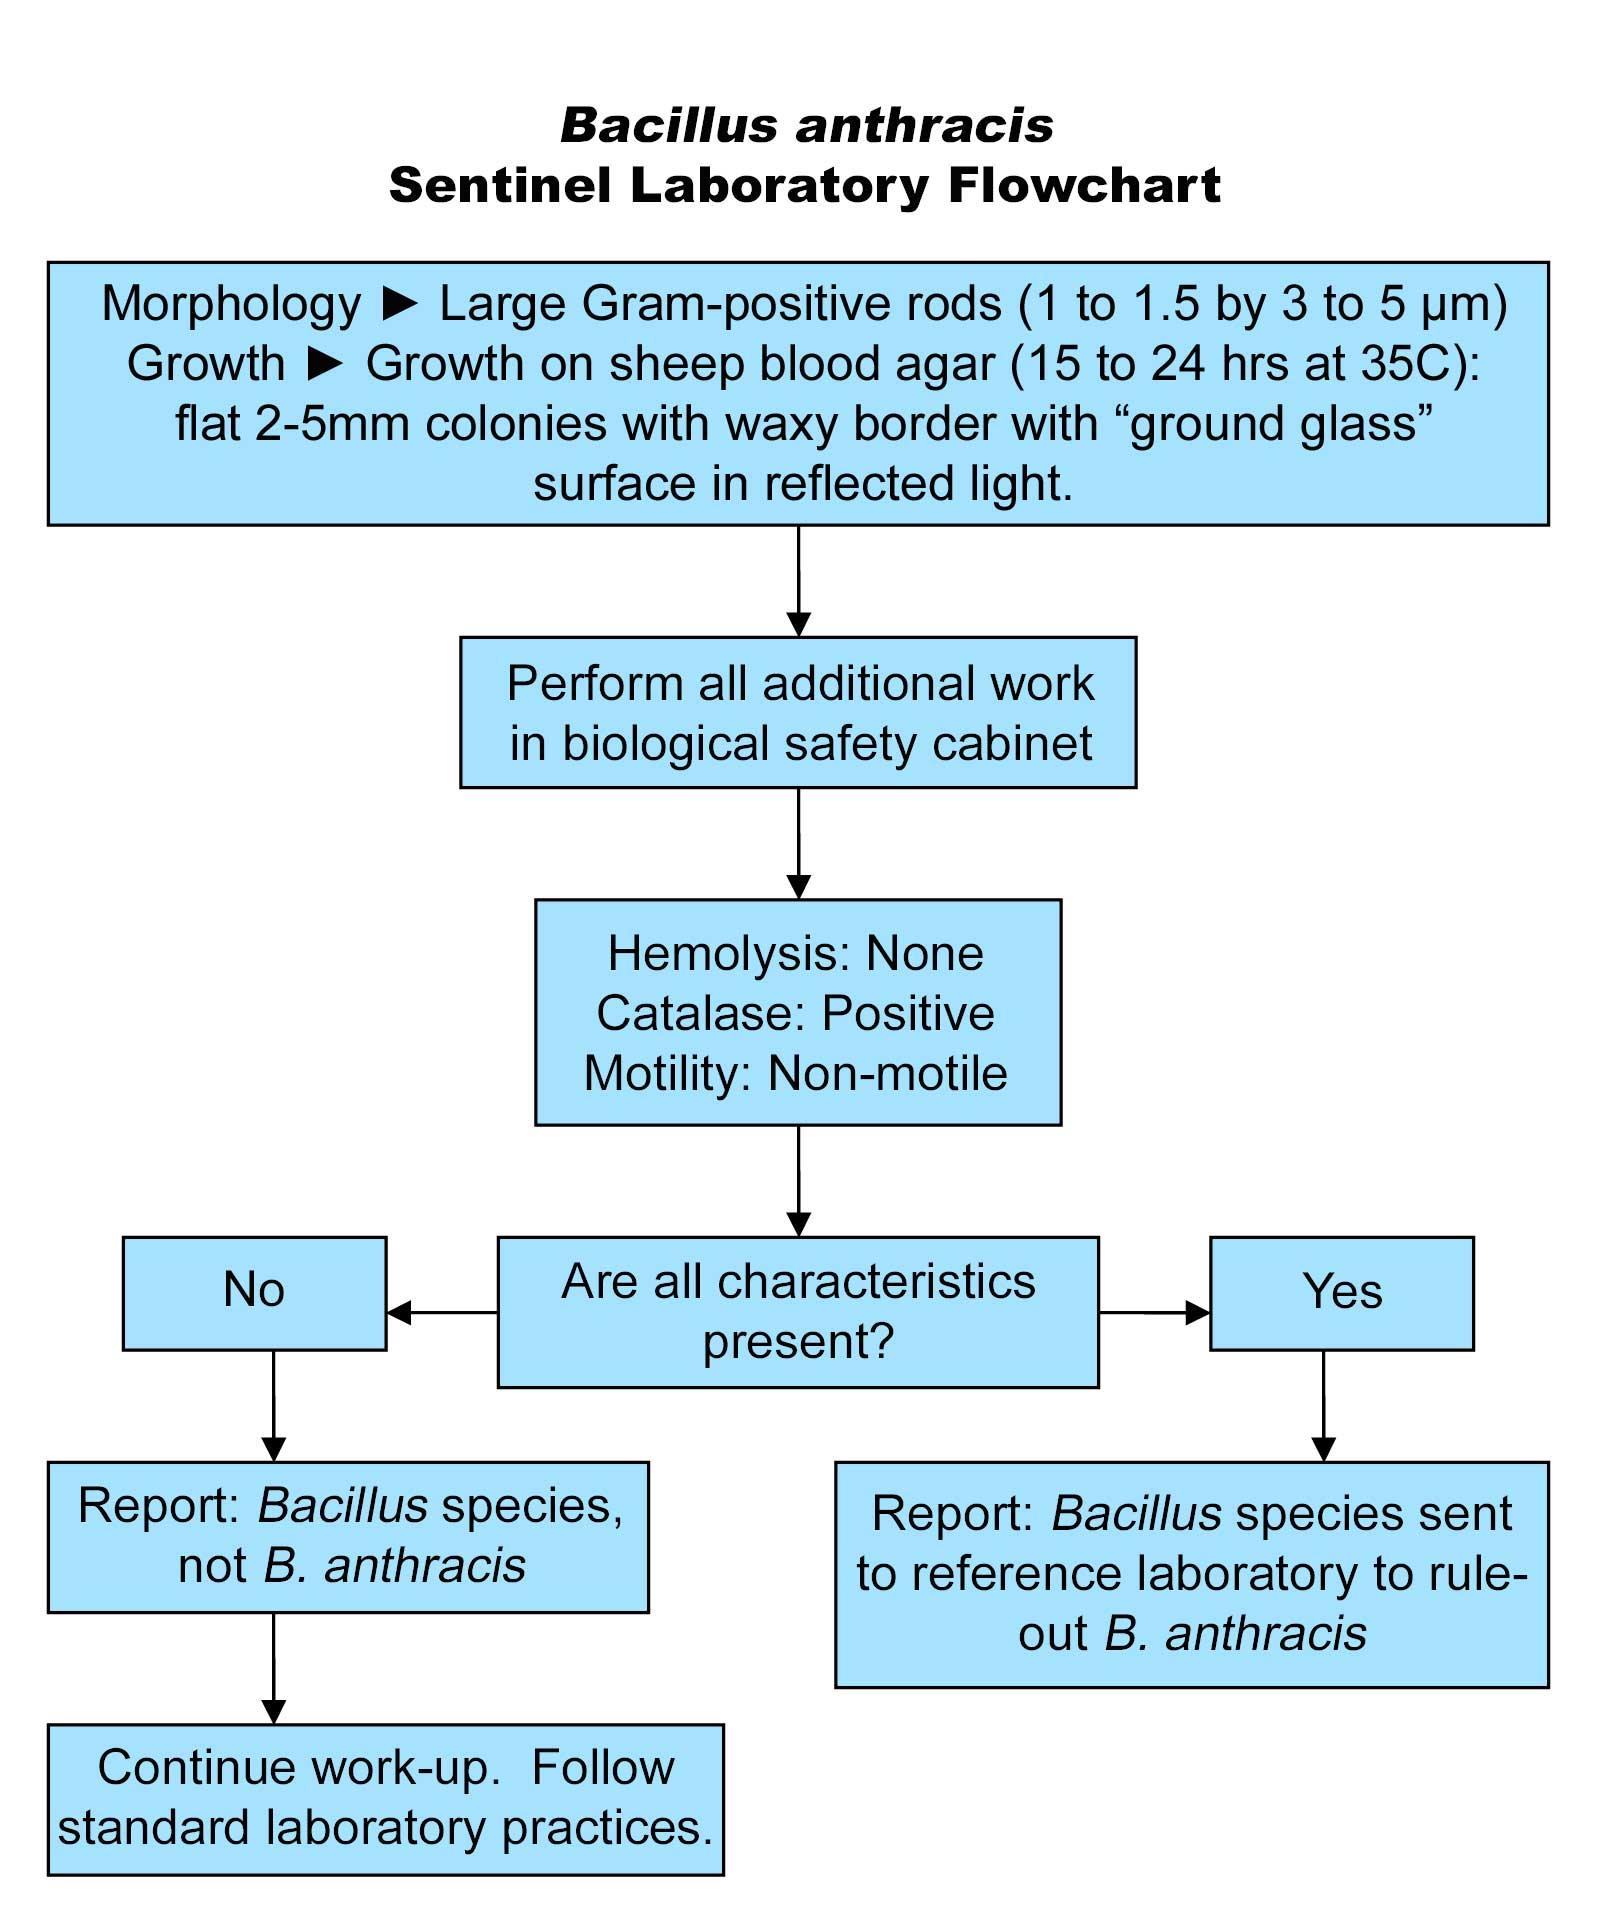 Bacillus anthracis Sentinel Laboratory Flowchart